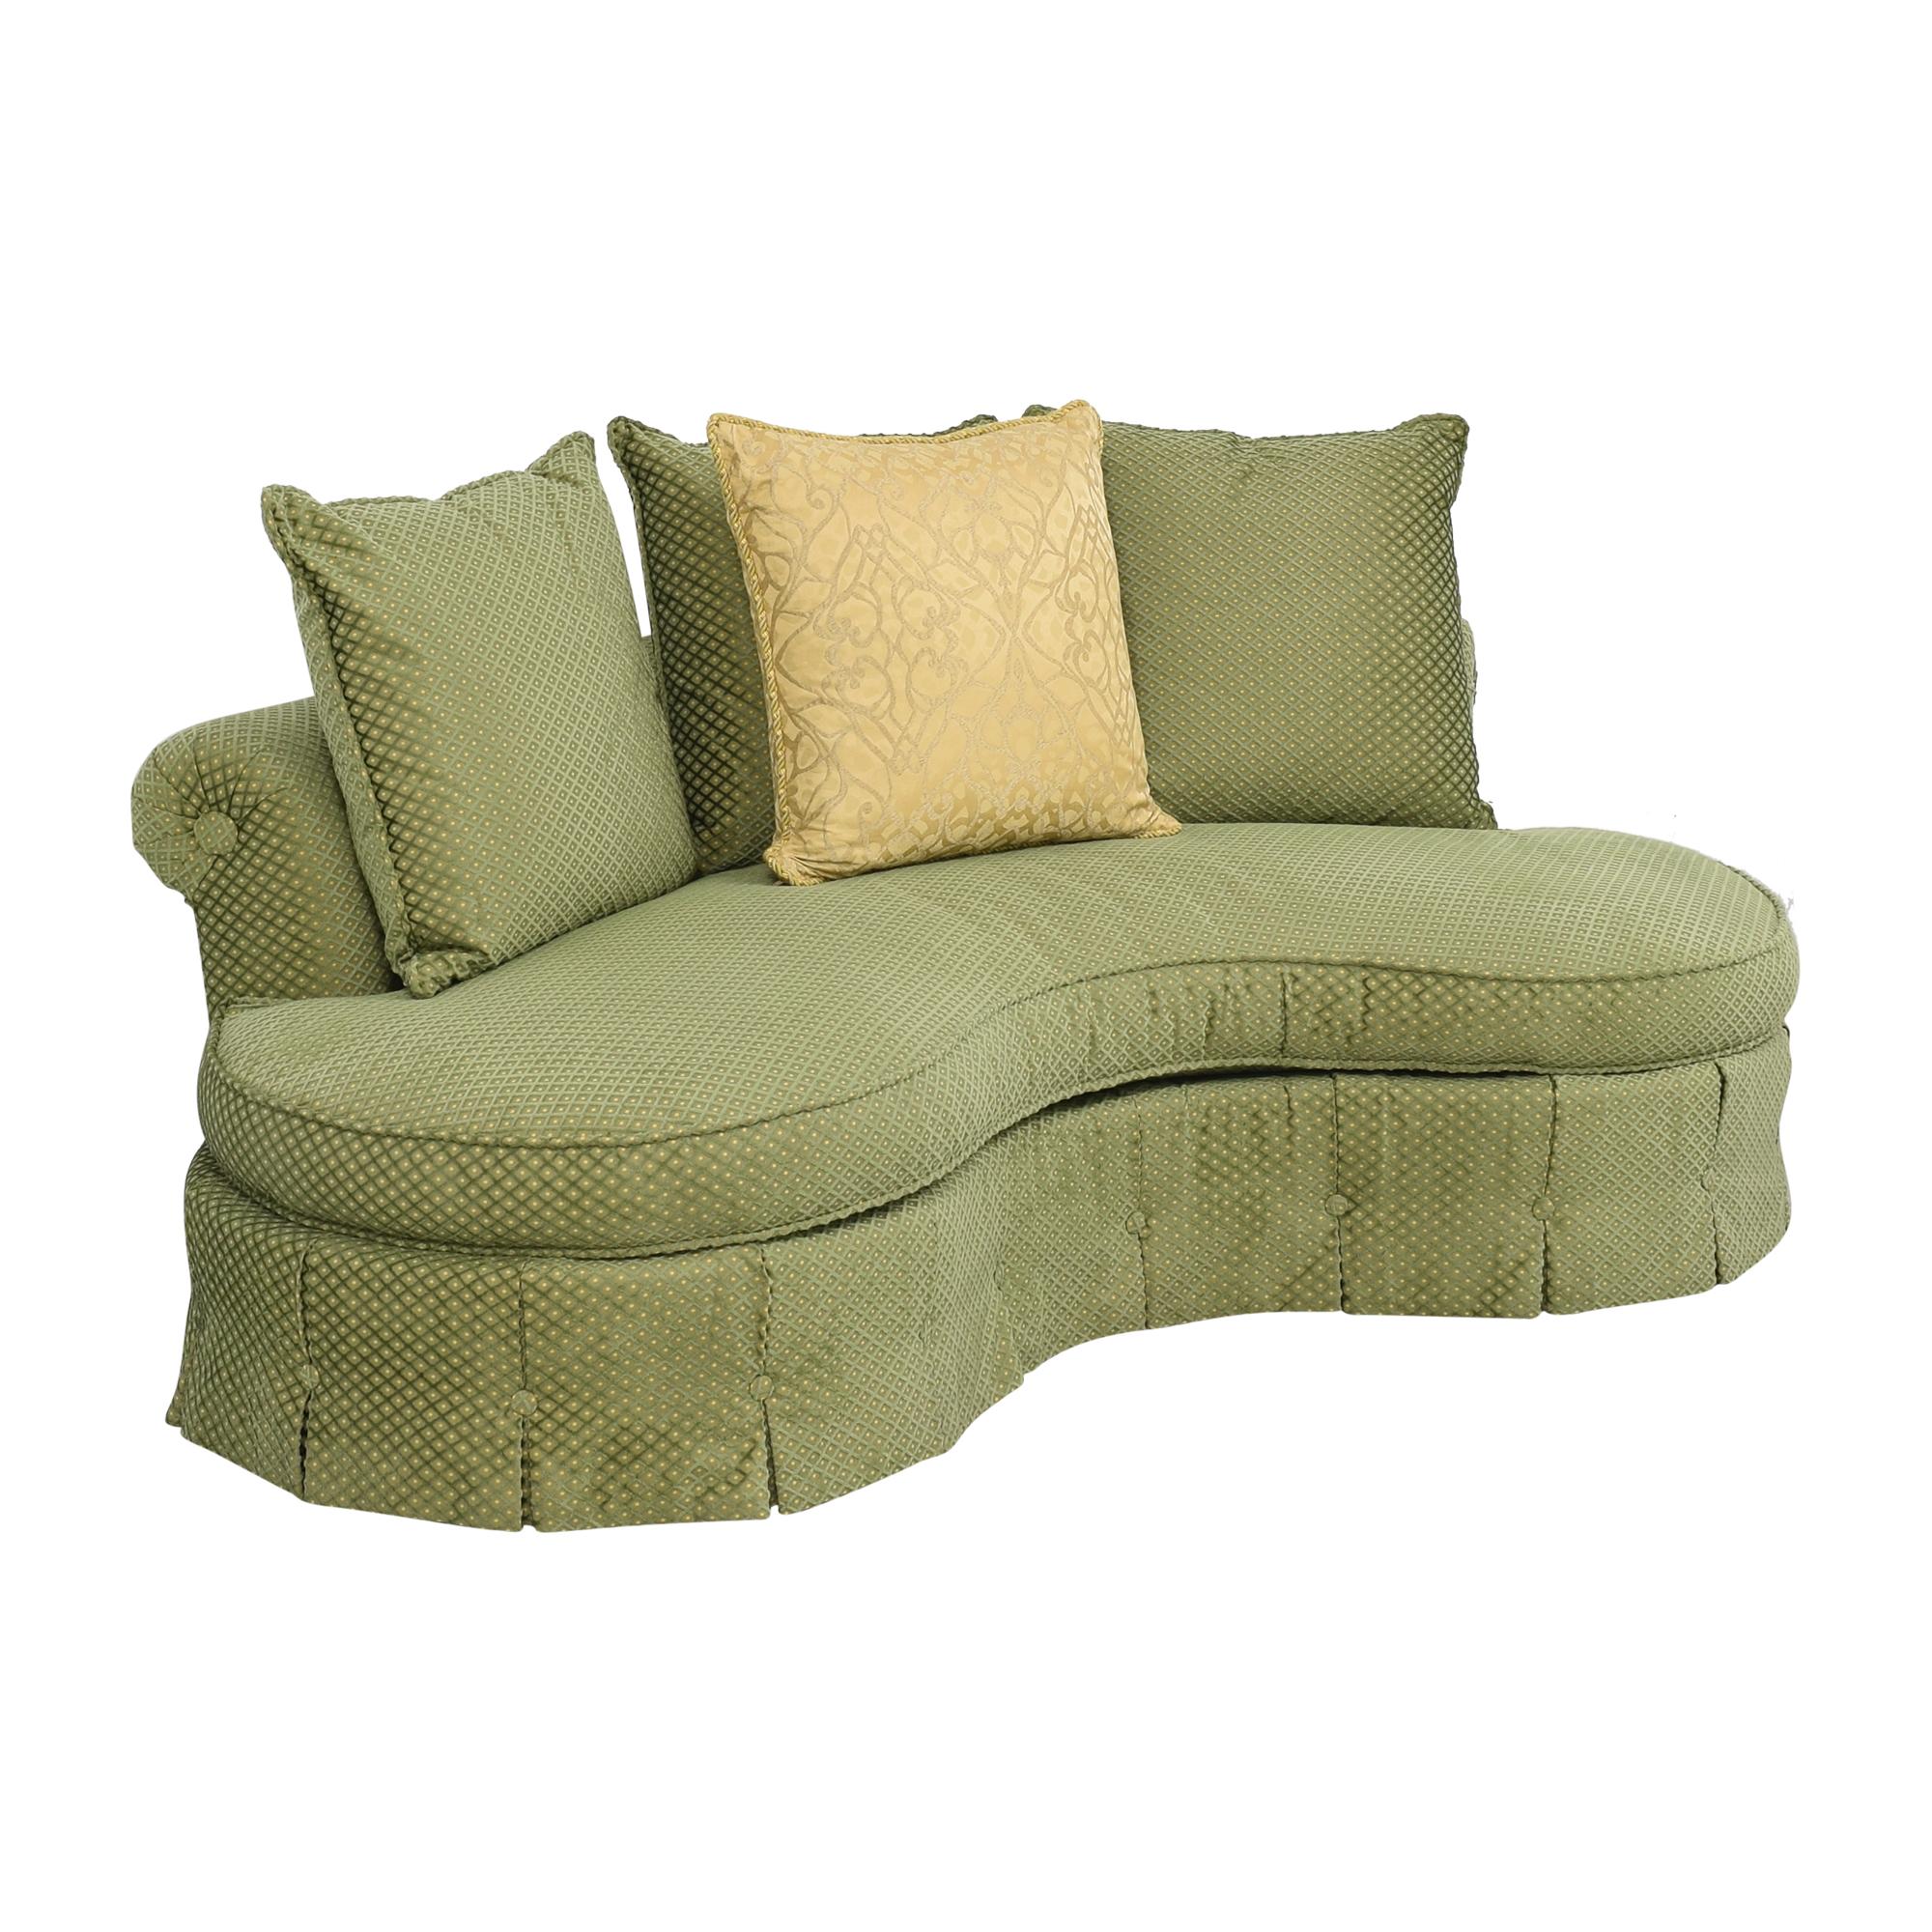 Custom Curved Sofa with Skirted Base and Matching Ottoman coupon